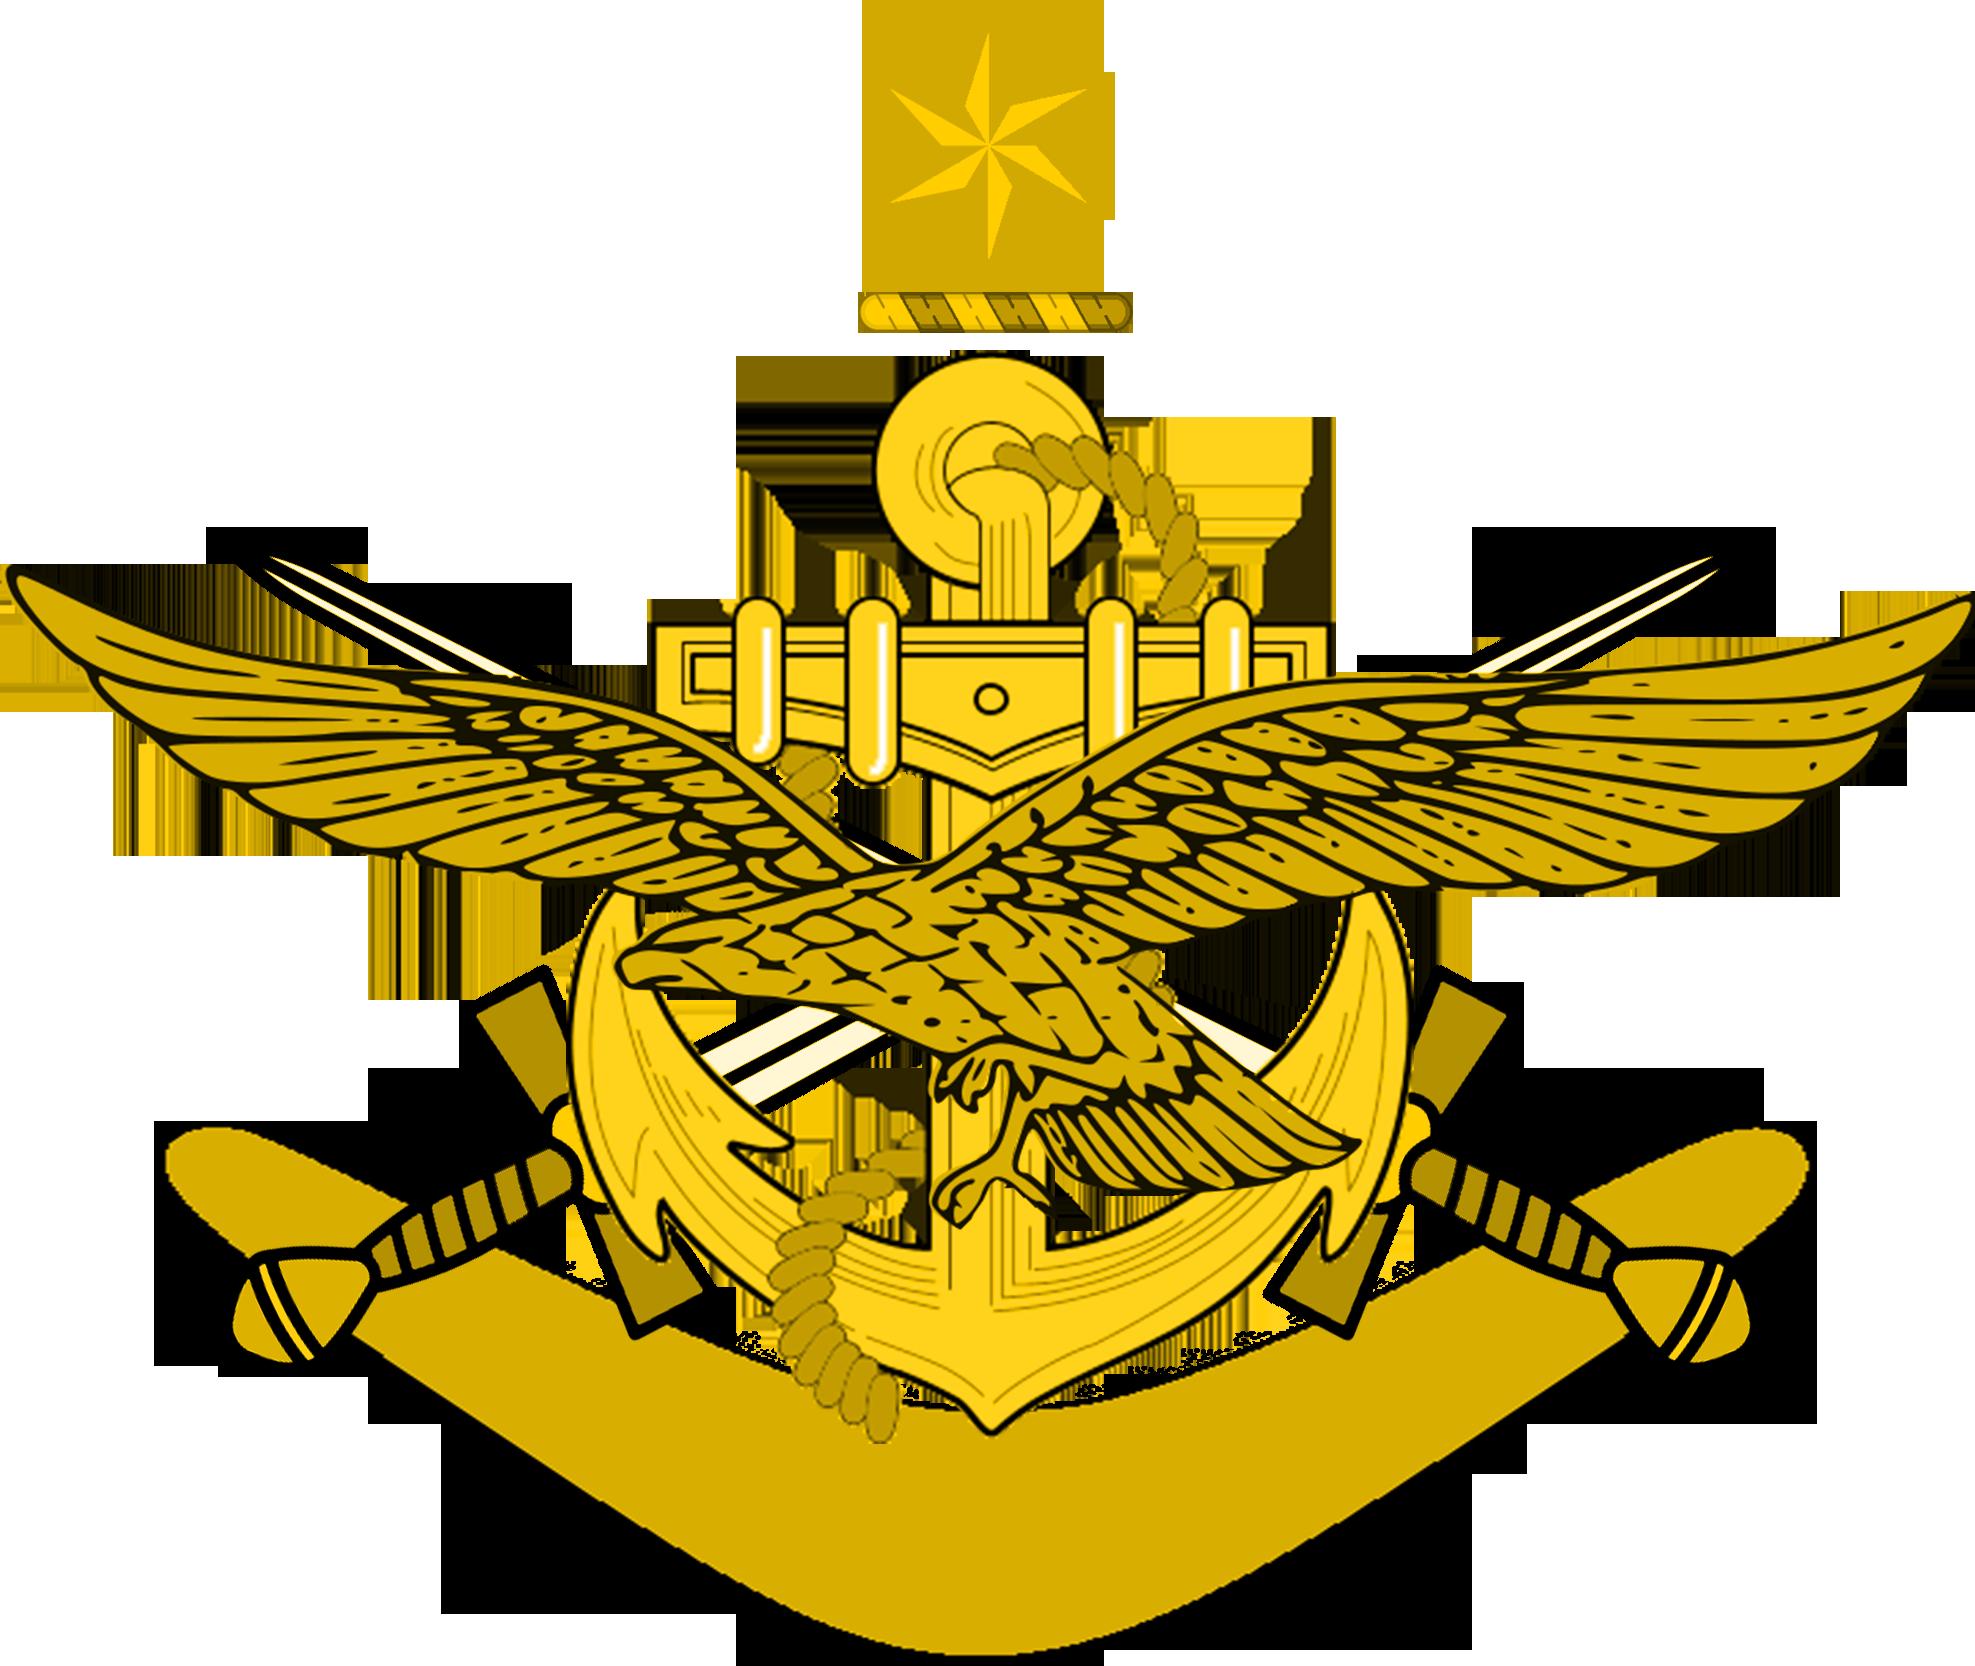 Cygnian Armed Forces (Joan of What?)